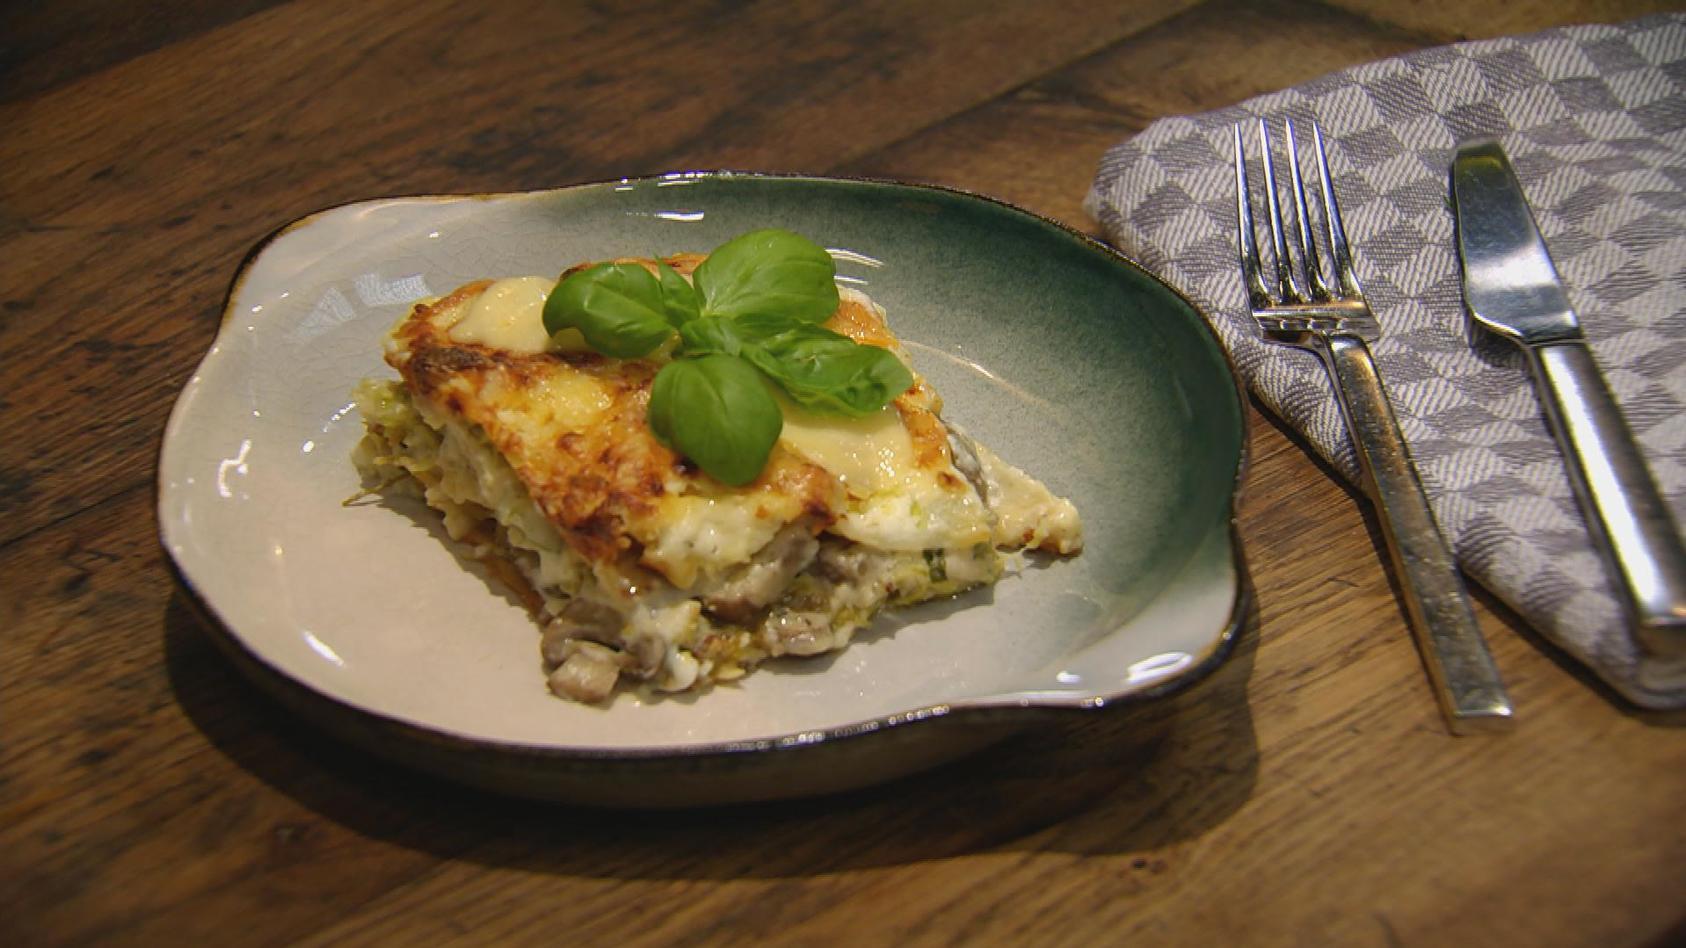 Lust auf Vegetarisch – Gemüse mal anders: Wirsing-Pilz-Lasagne